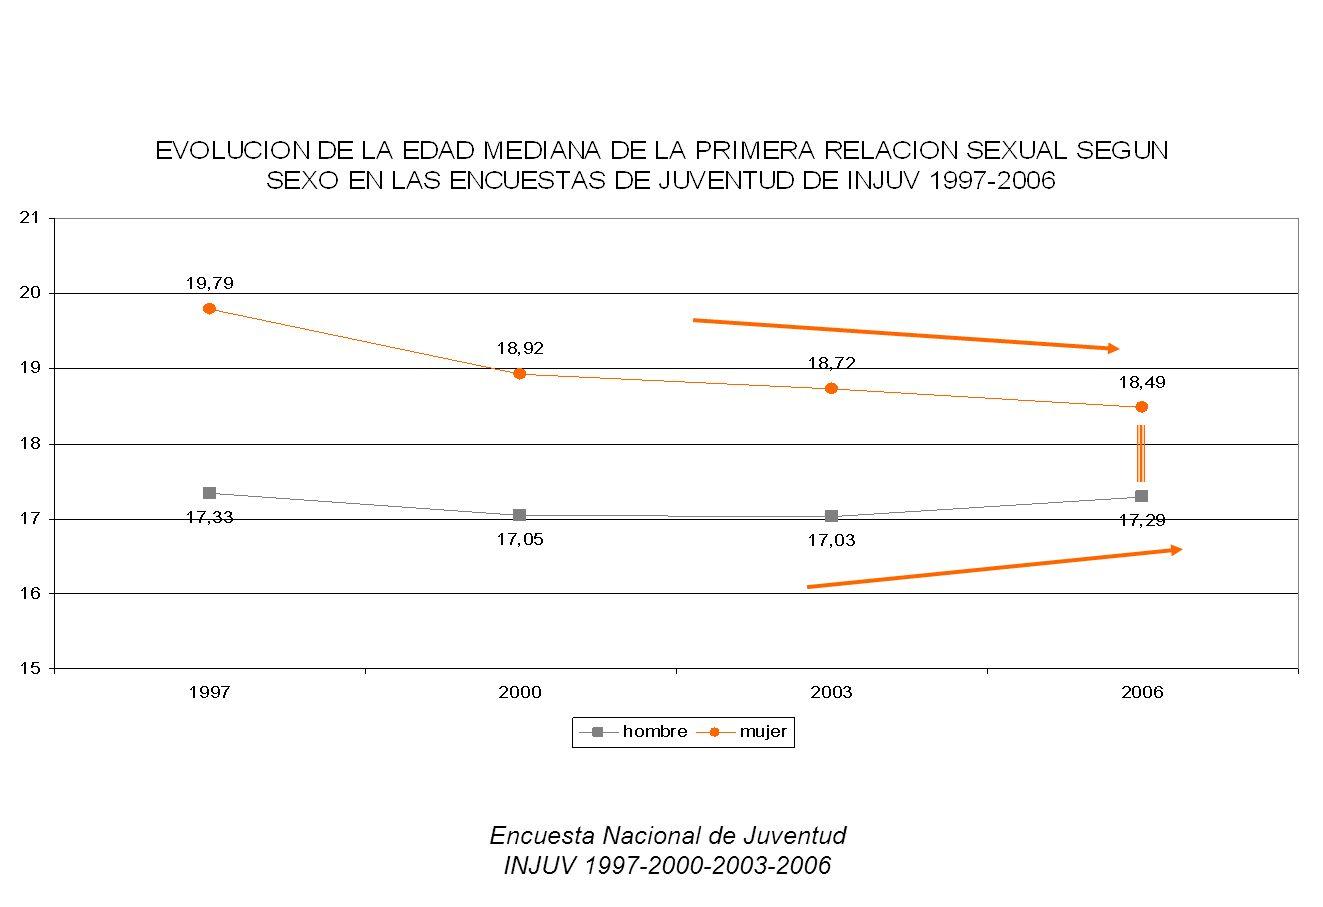 Encuesta Nacional de Juventud INJUV 1997-2000-2003-2006